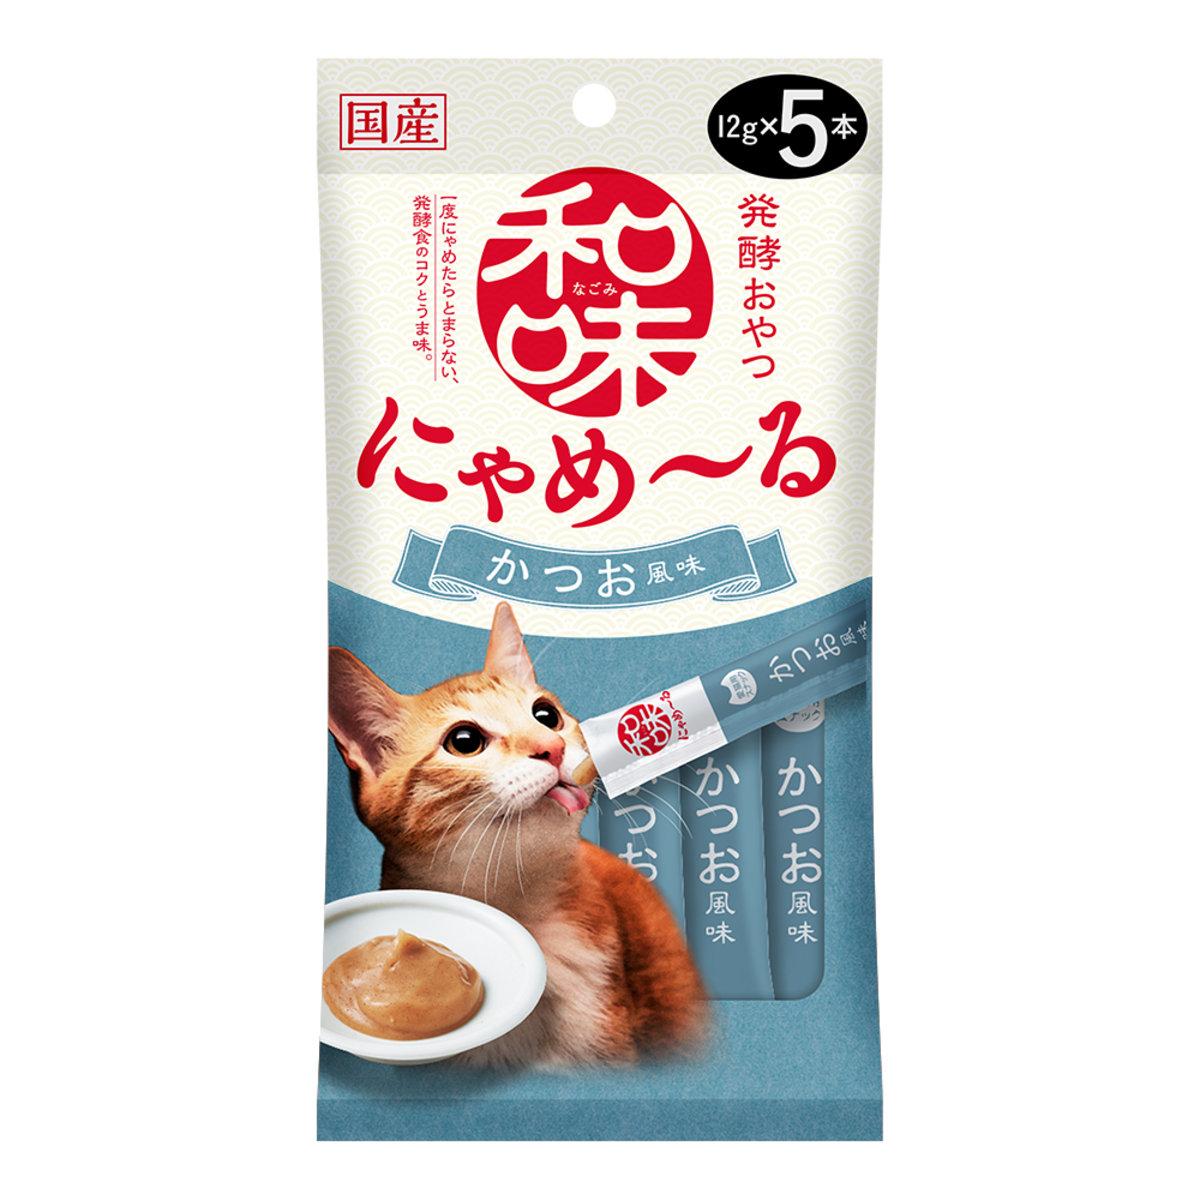 Nagomi Bonito Creamy for Cats